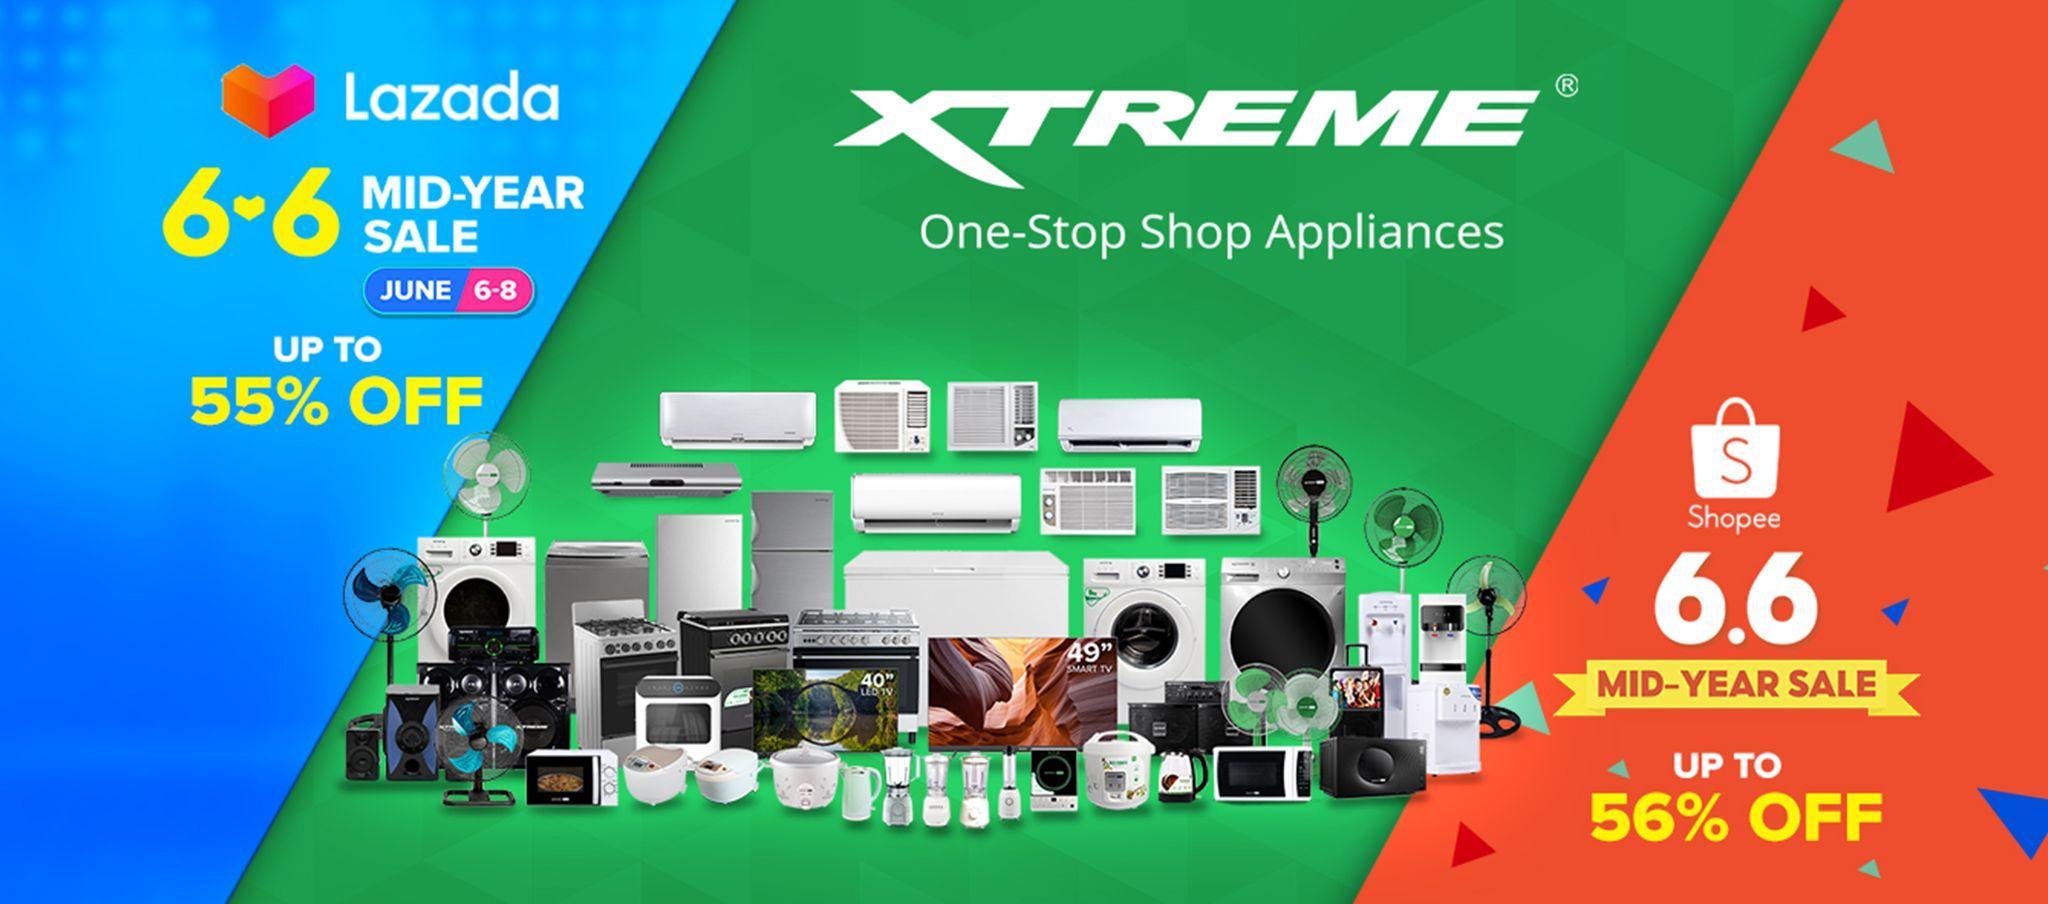 XTREME sale on Lazada and Shopee